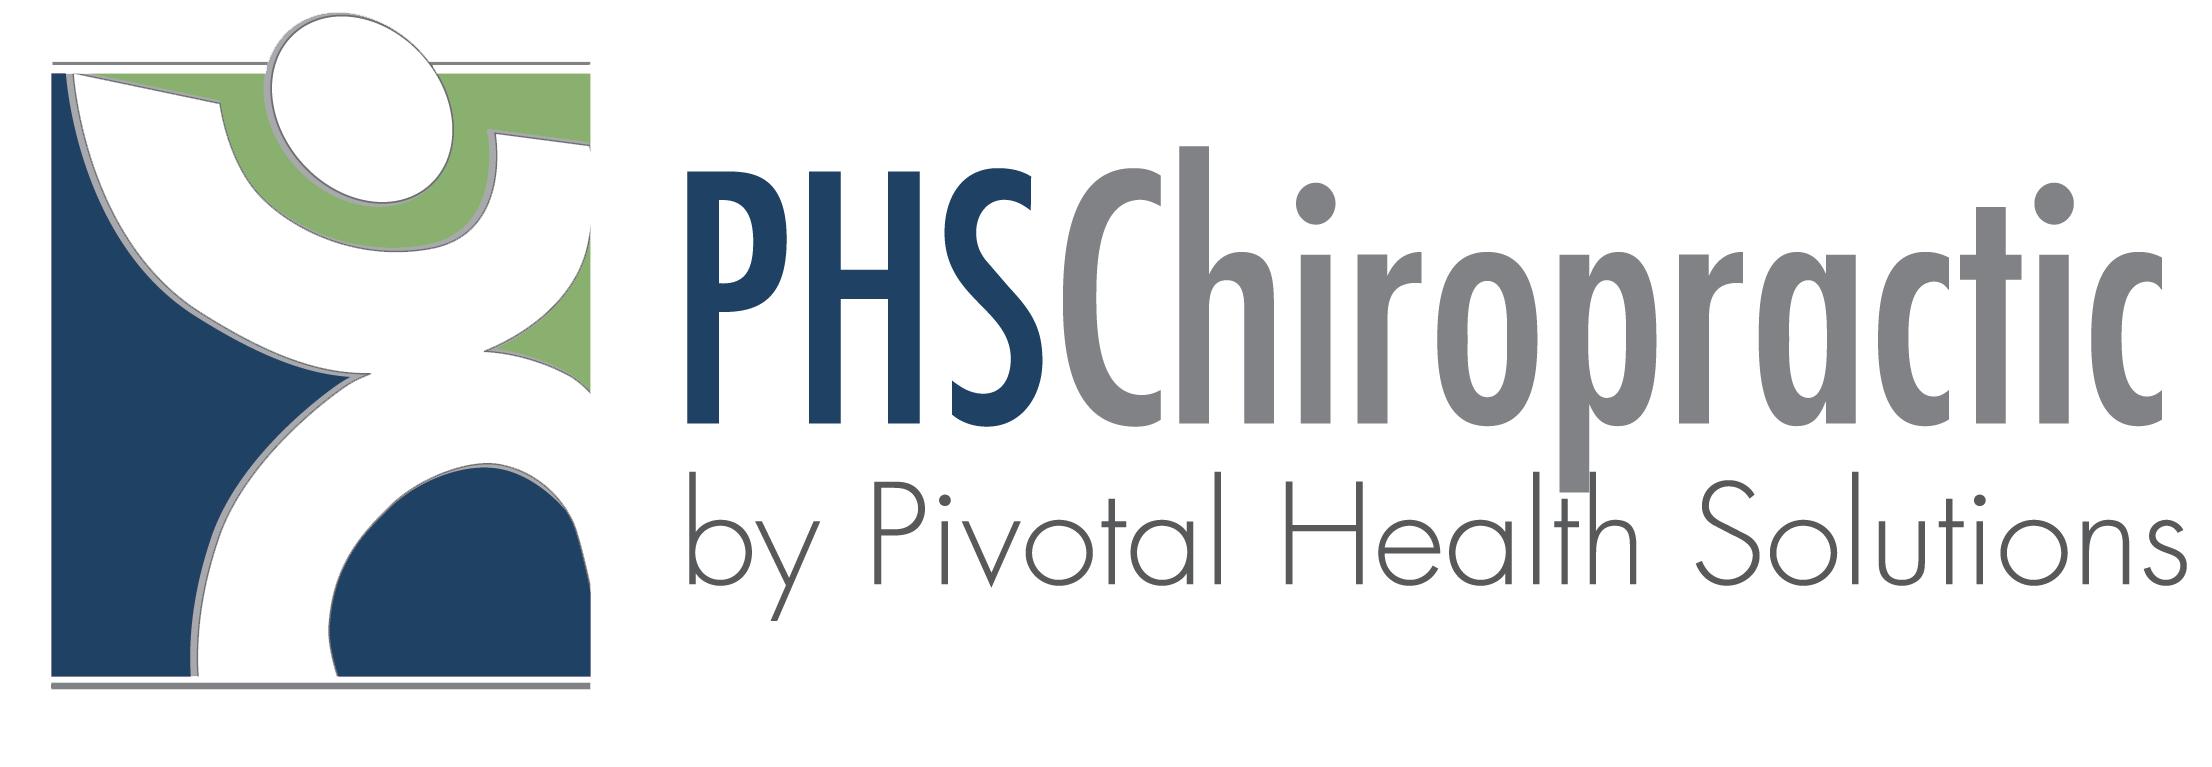 PHS-Chiropractic-Horizontal-logo-2